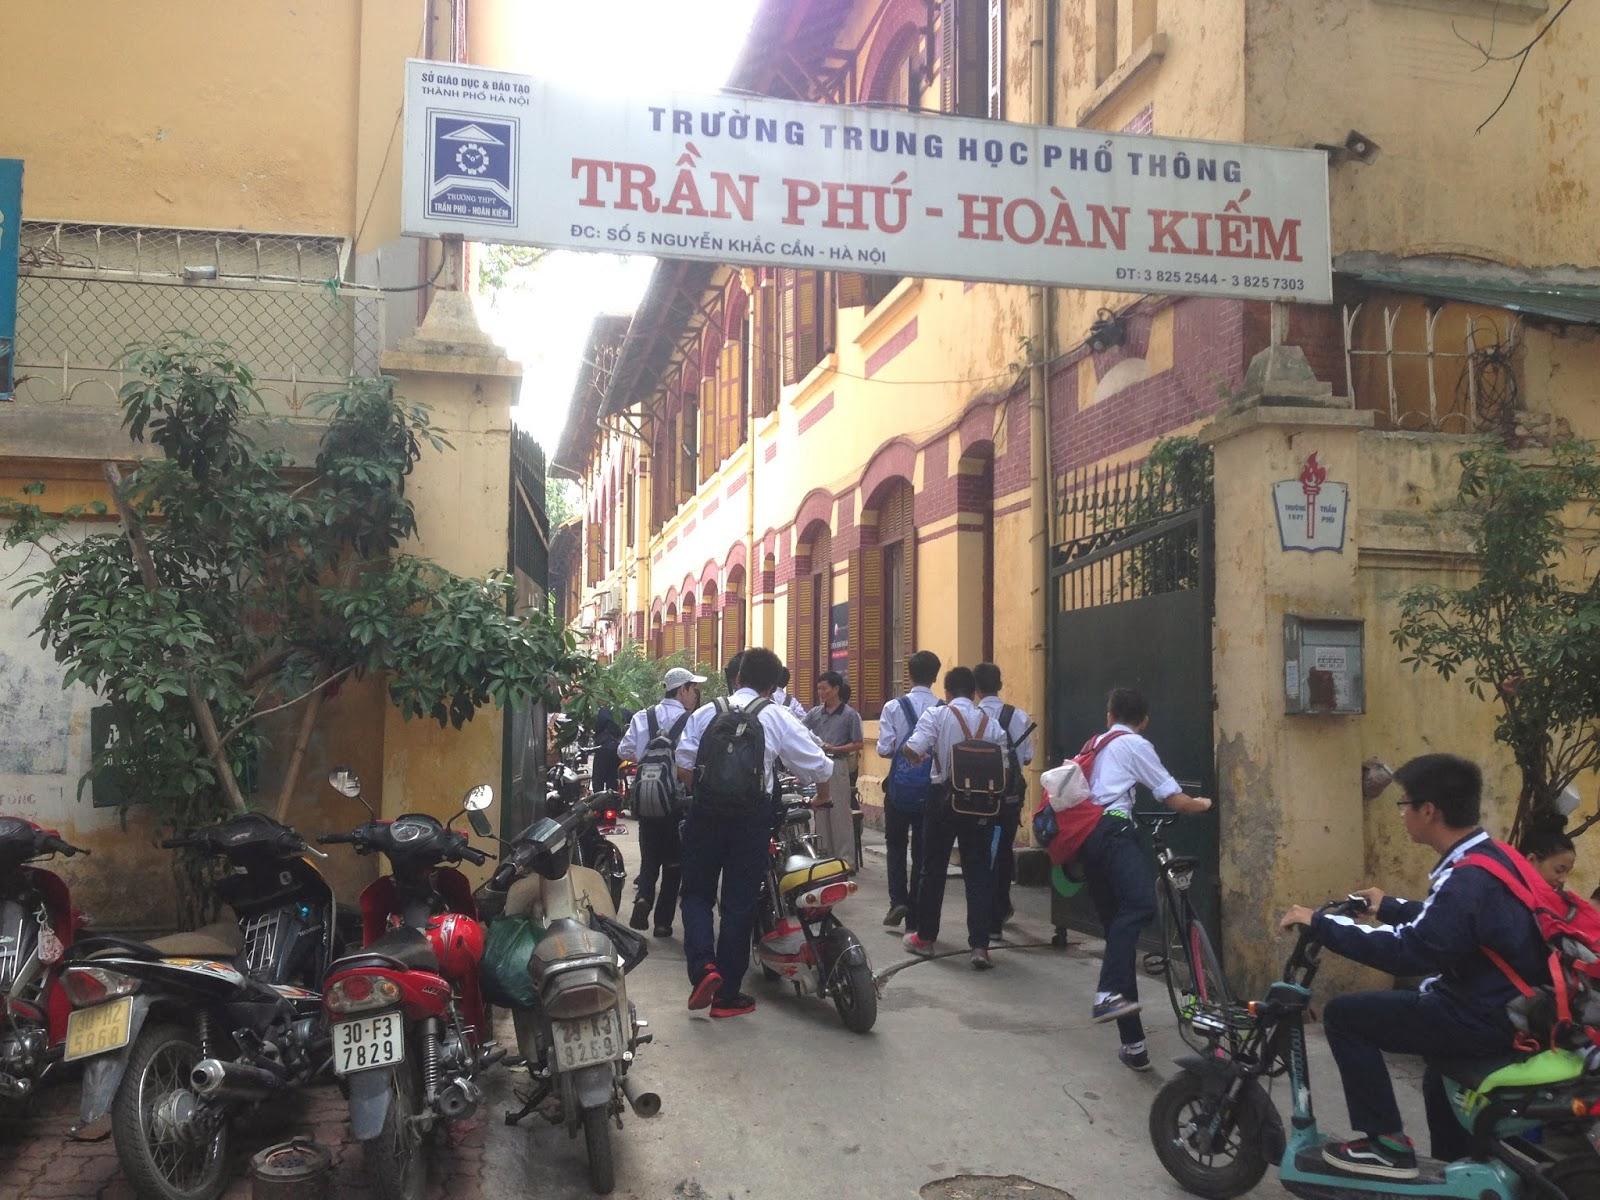 school-vietnam ハノイの学校